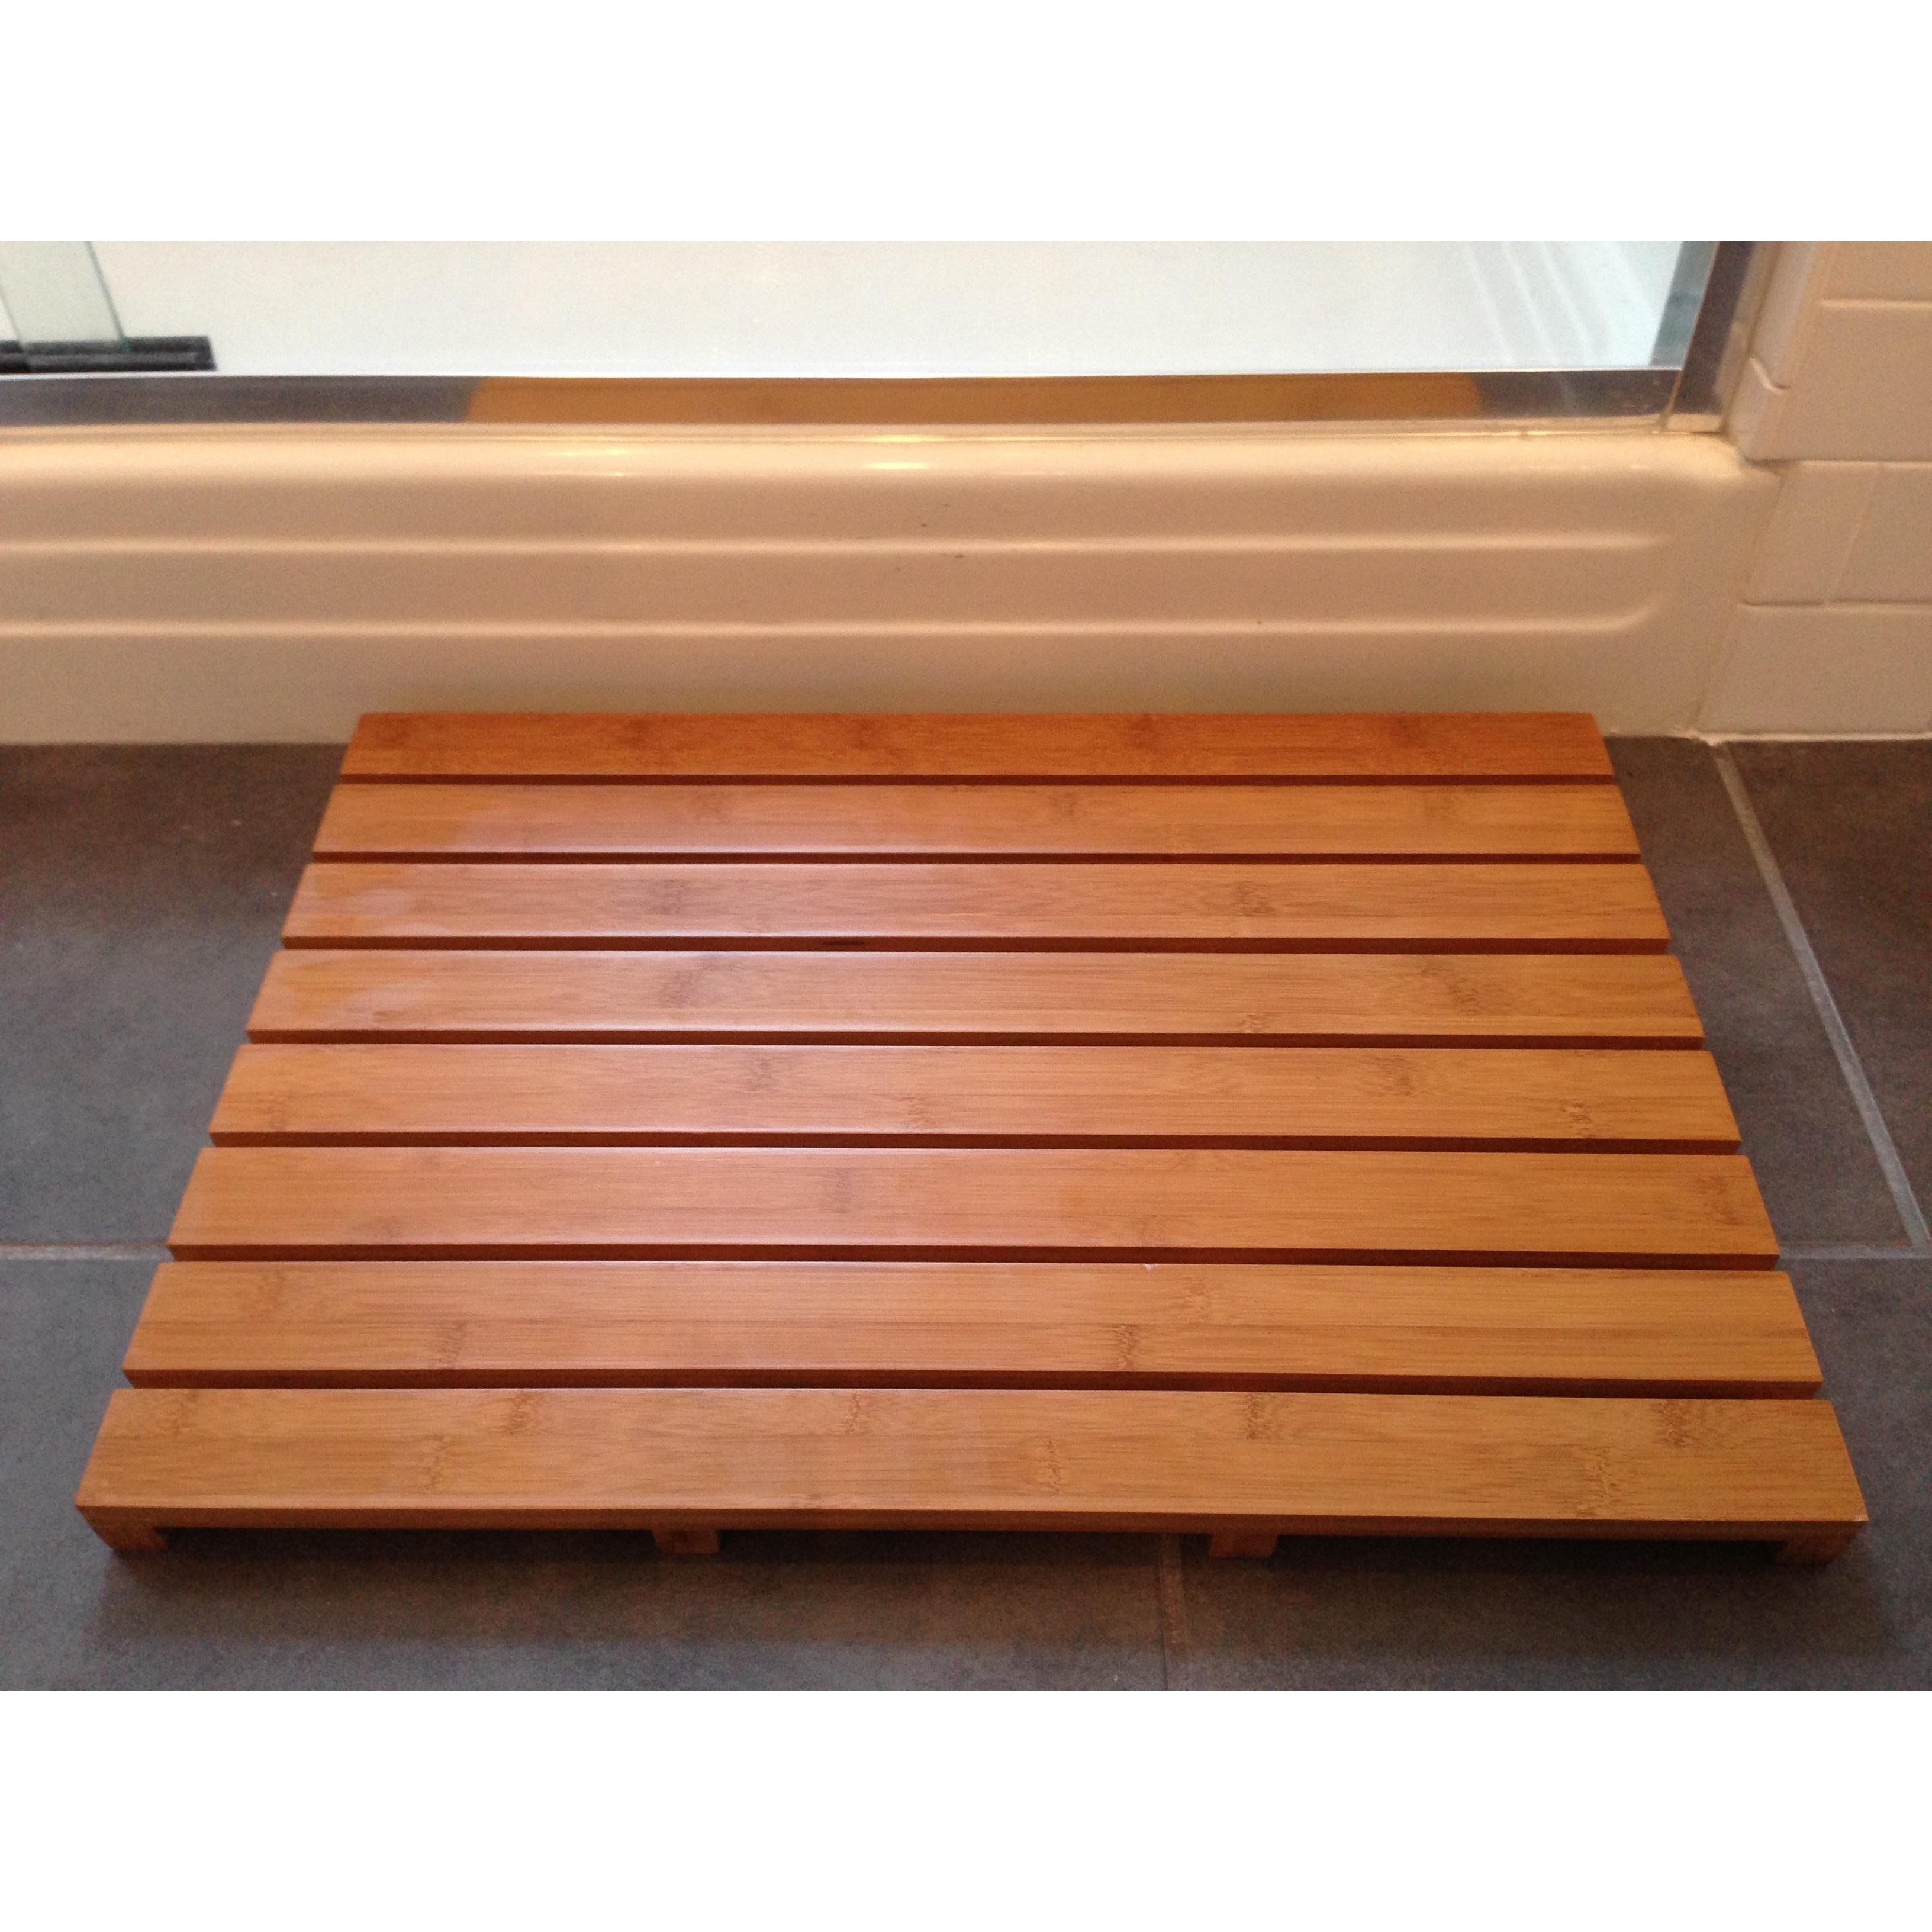 Jani Bamboo Bath and Sauna Mat (16x24), Tan (Wood, Solid ...